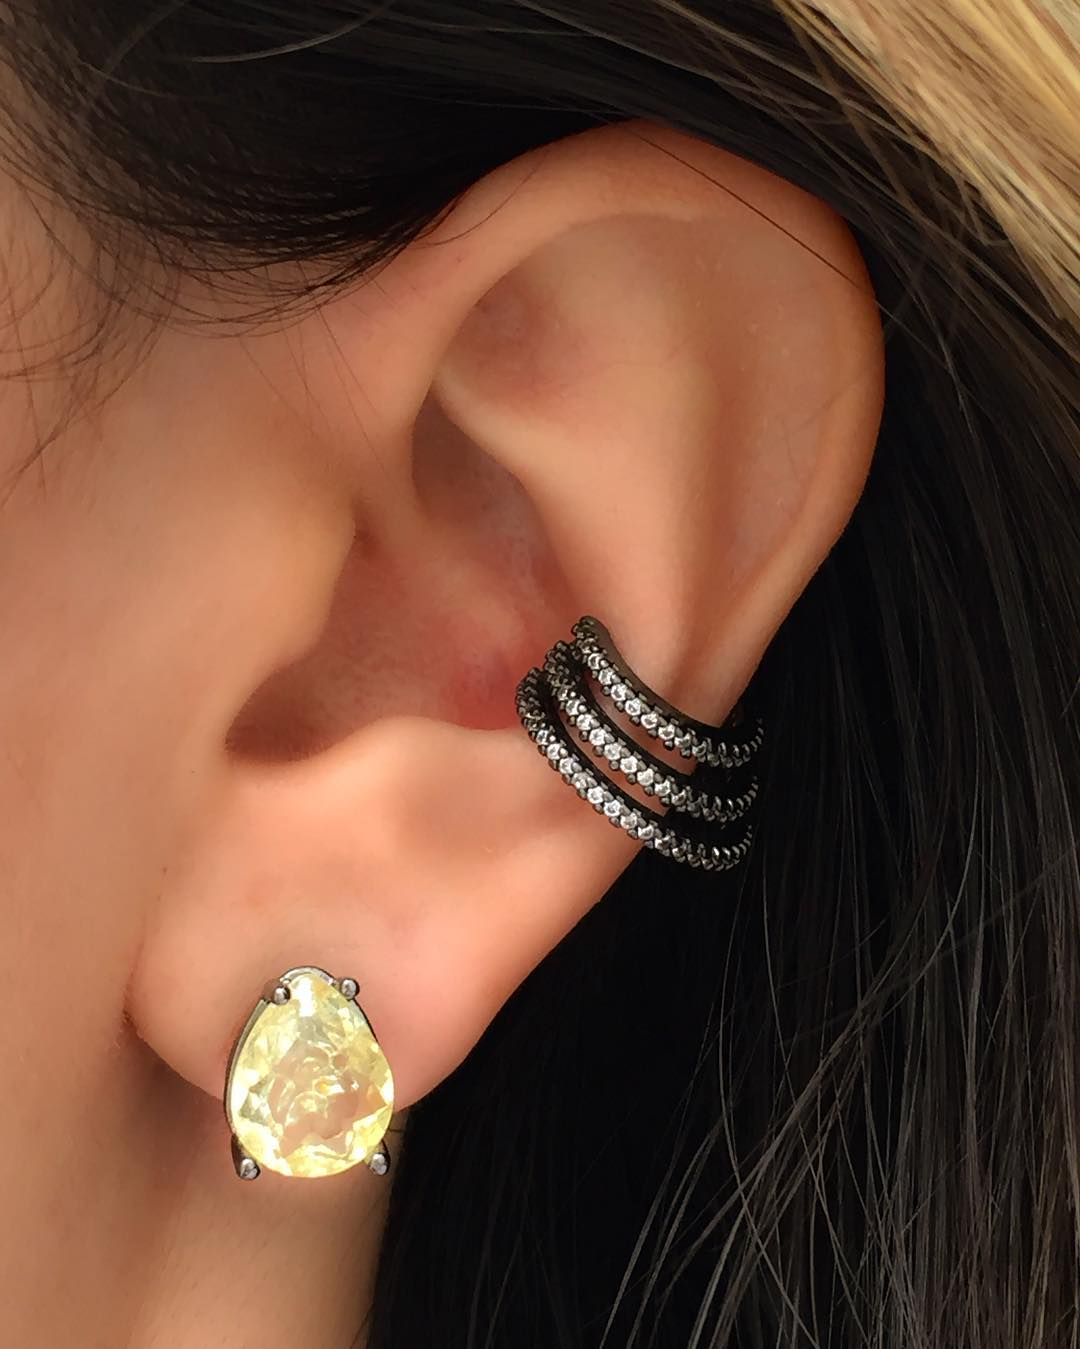 piercing conch triplo